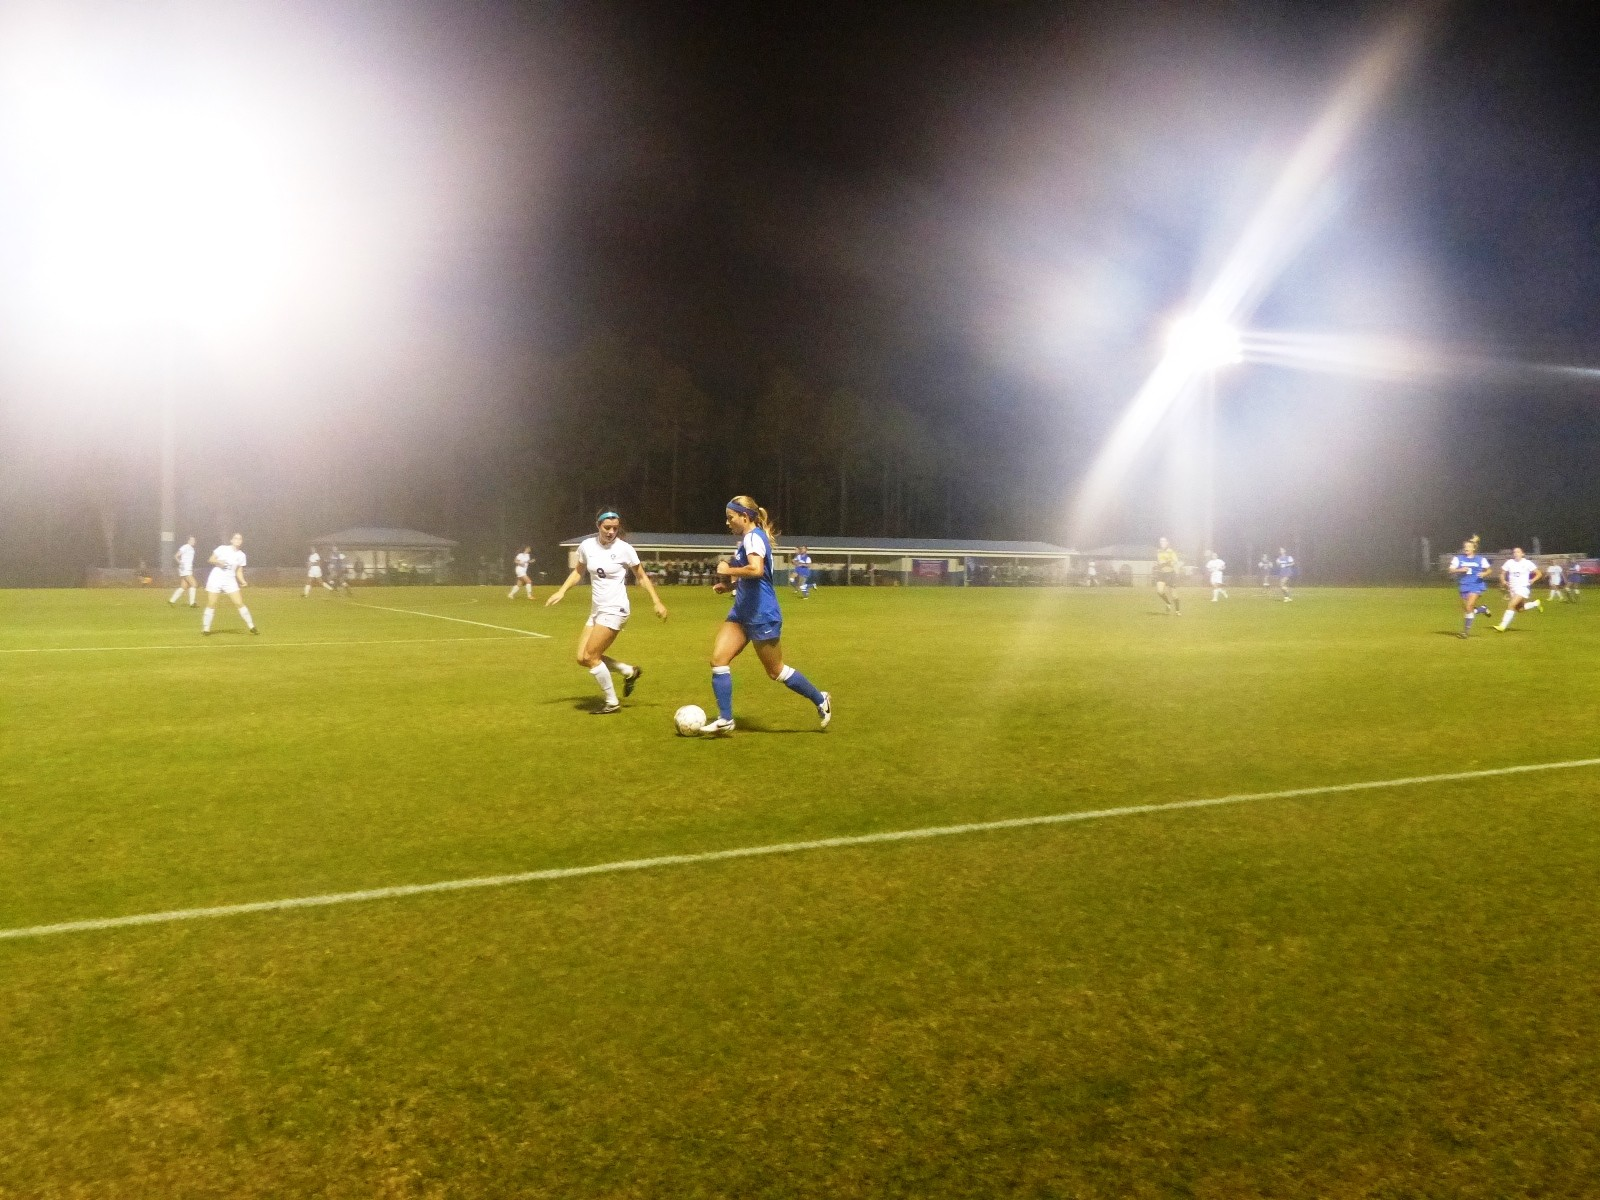 2014_NAIA_Womens_Soccer_National_Championships_Concordia_vs_Cal_State_San_Marcos_12-1-14_29